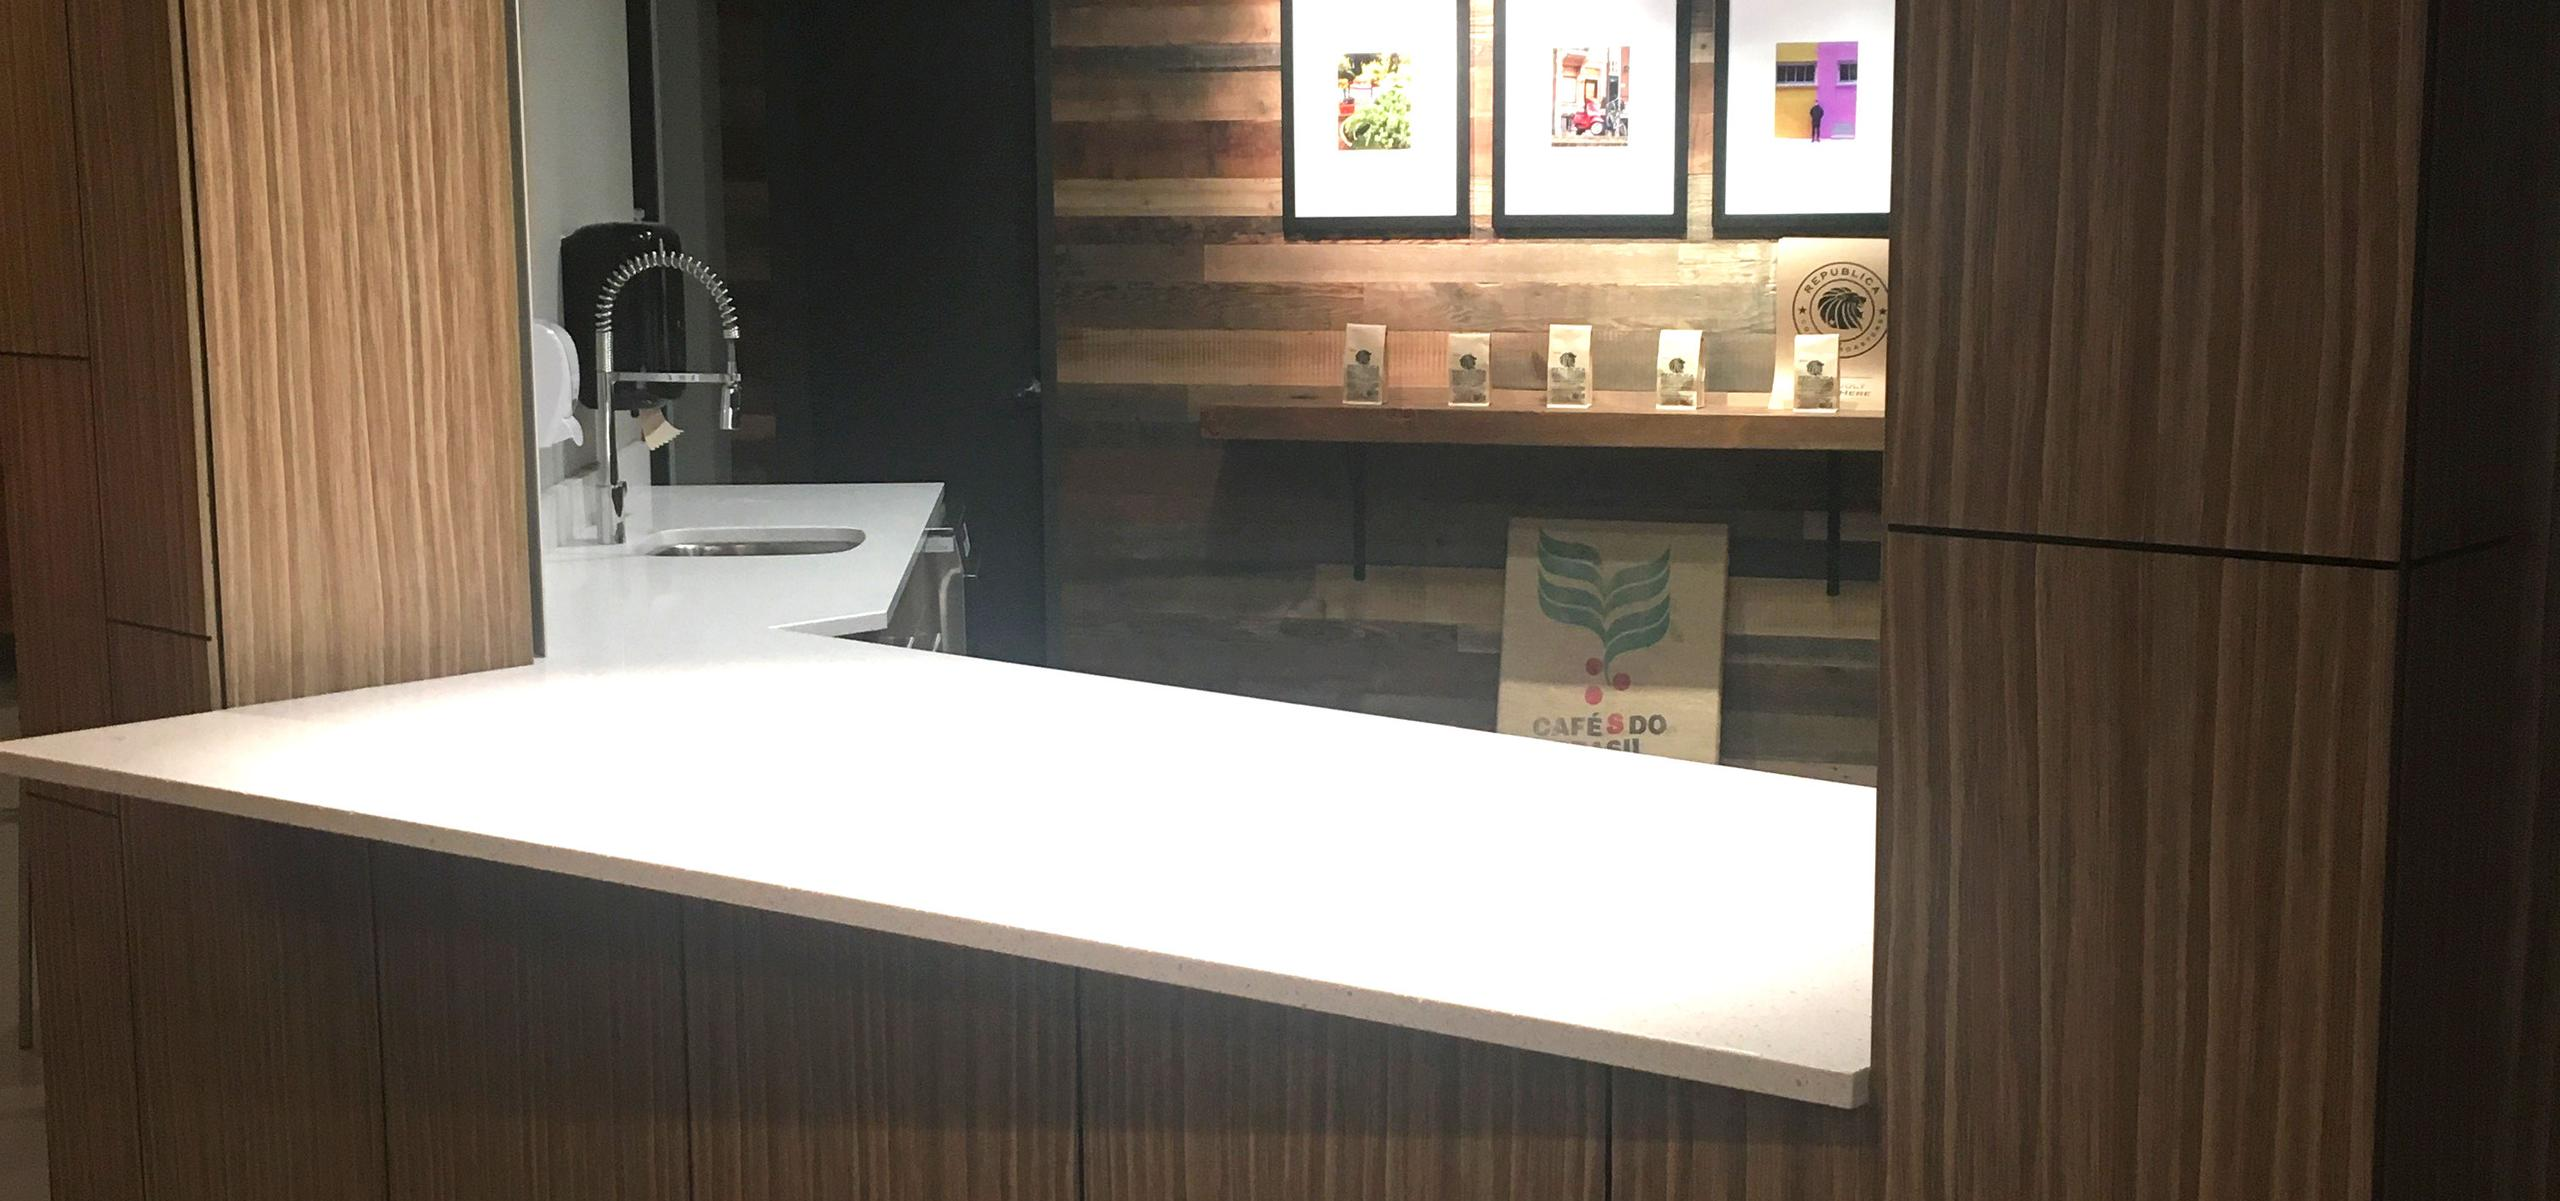 CLA Church | Coffee Bar